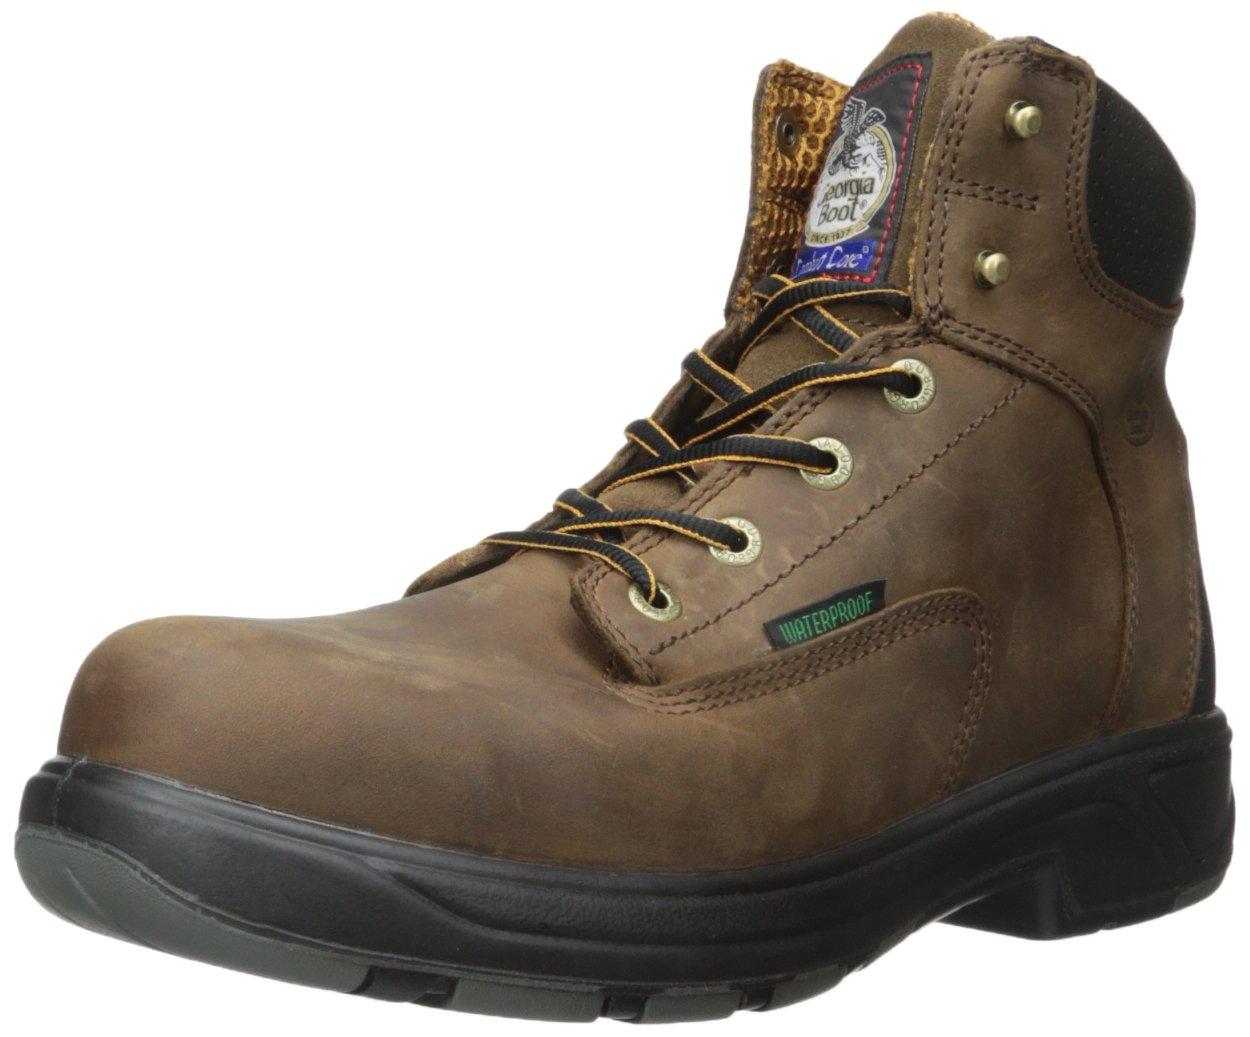 Georgia Boot メンズ ブラウン 14 D(M) US 14 D(M) USブラウン B0037KSPU2